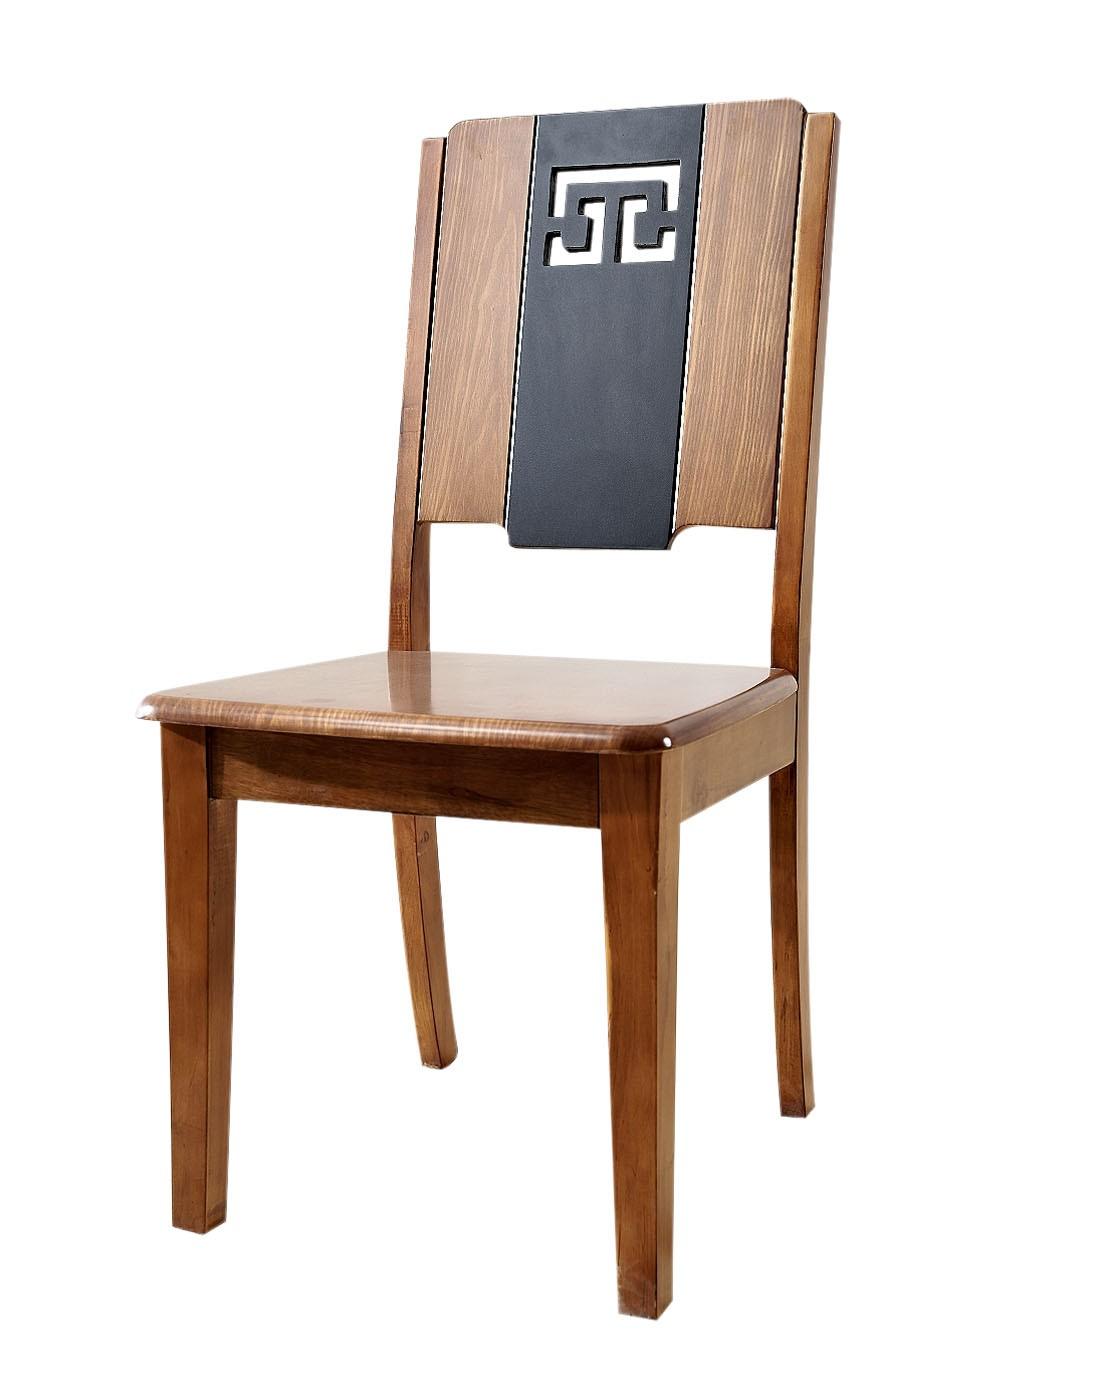 homes家具专场实木中式餐椅(两把装)xhd